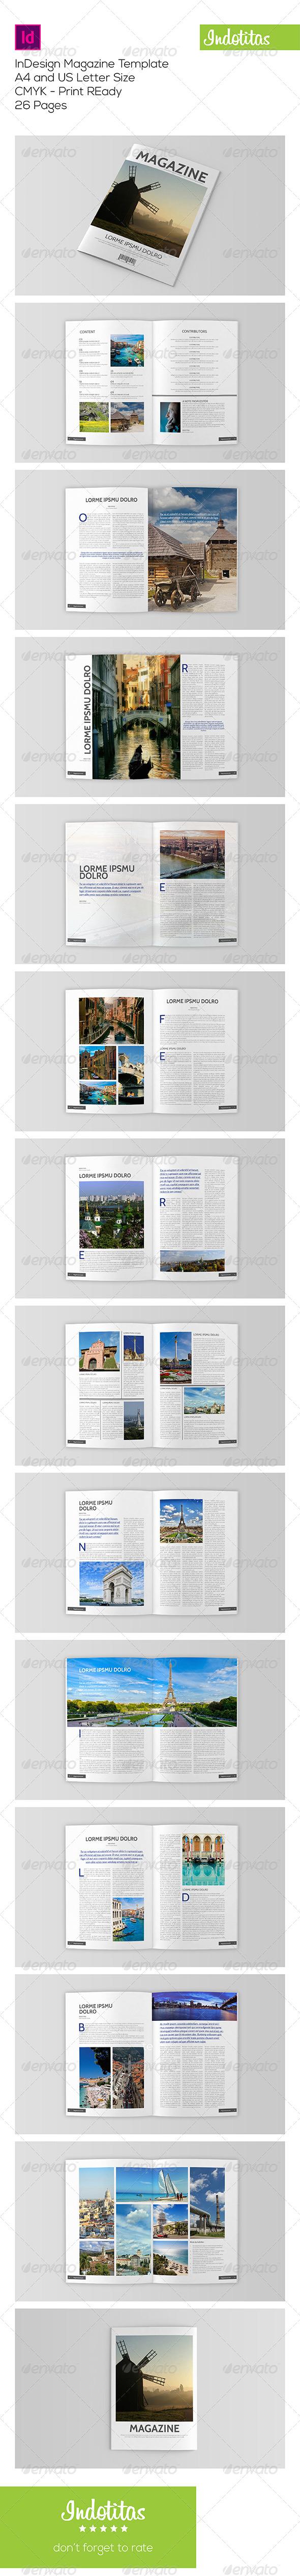 GraphicRiver Indesign Magazine Template 7824440